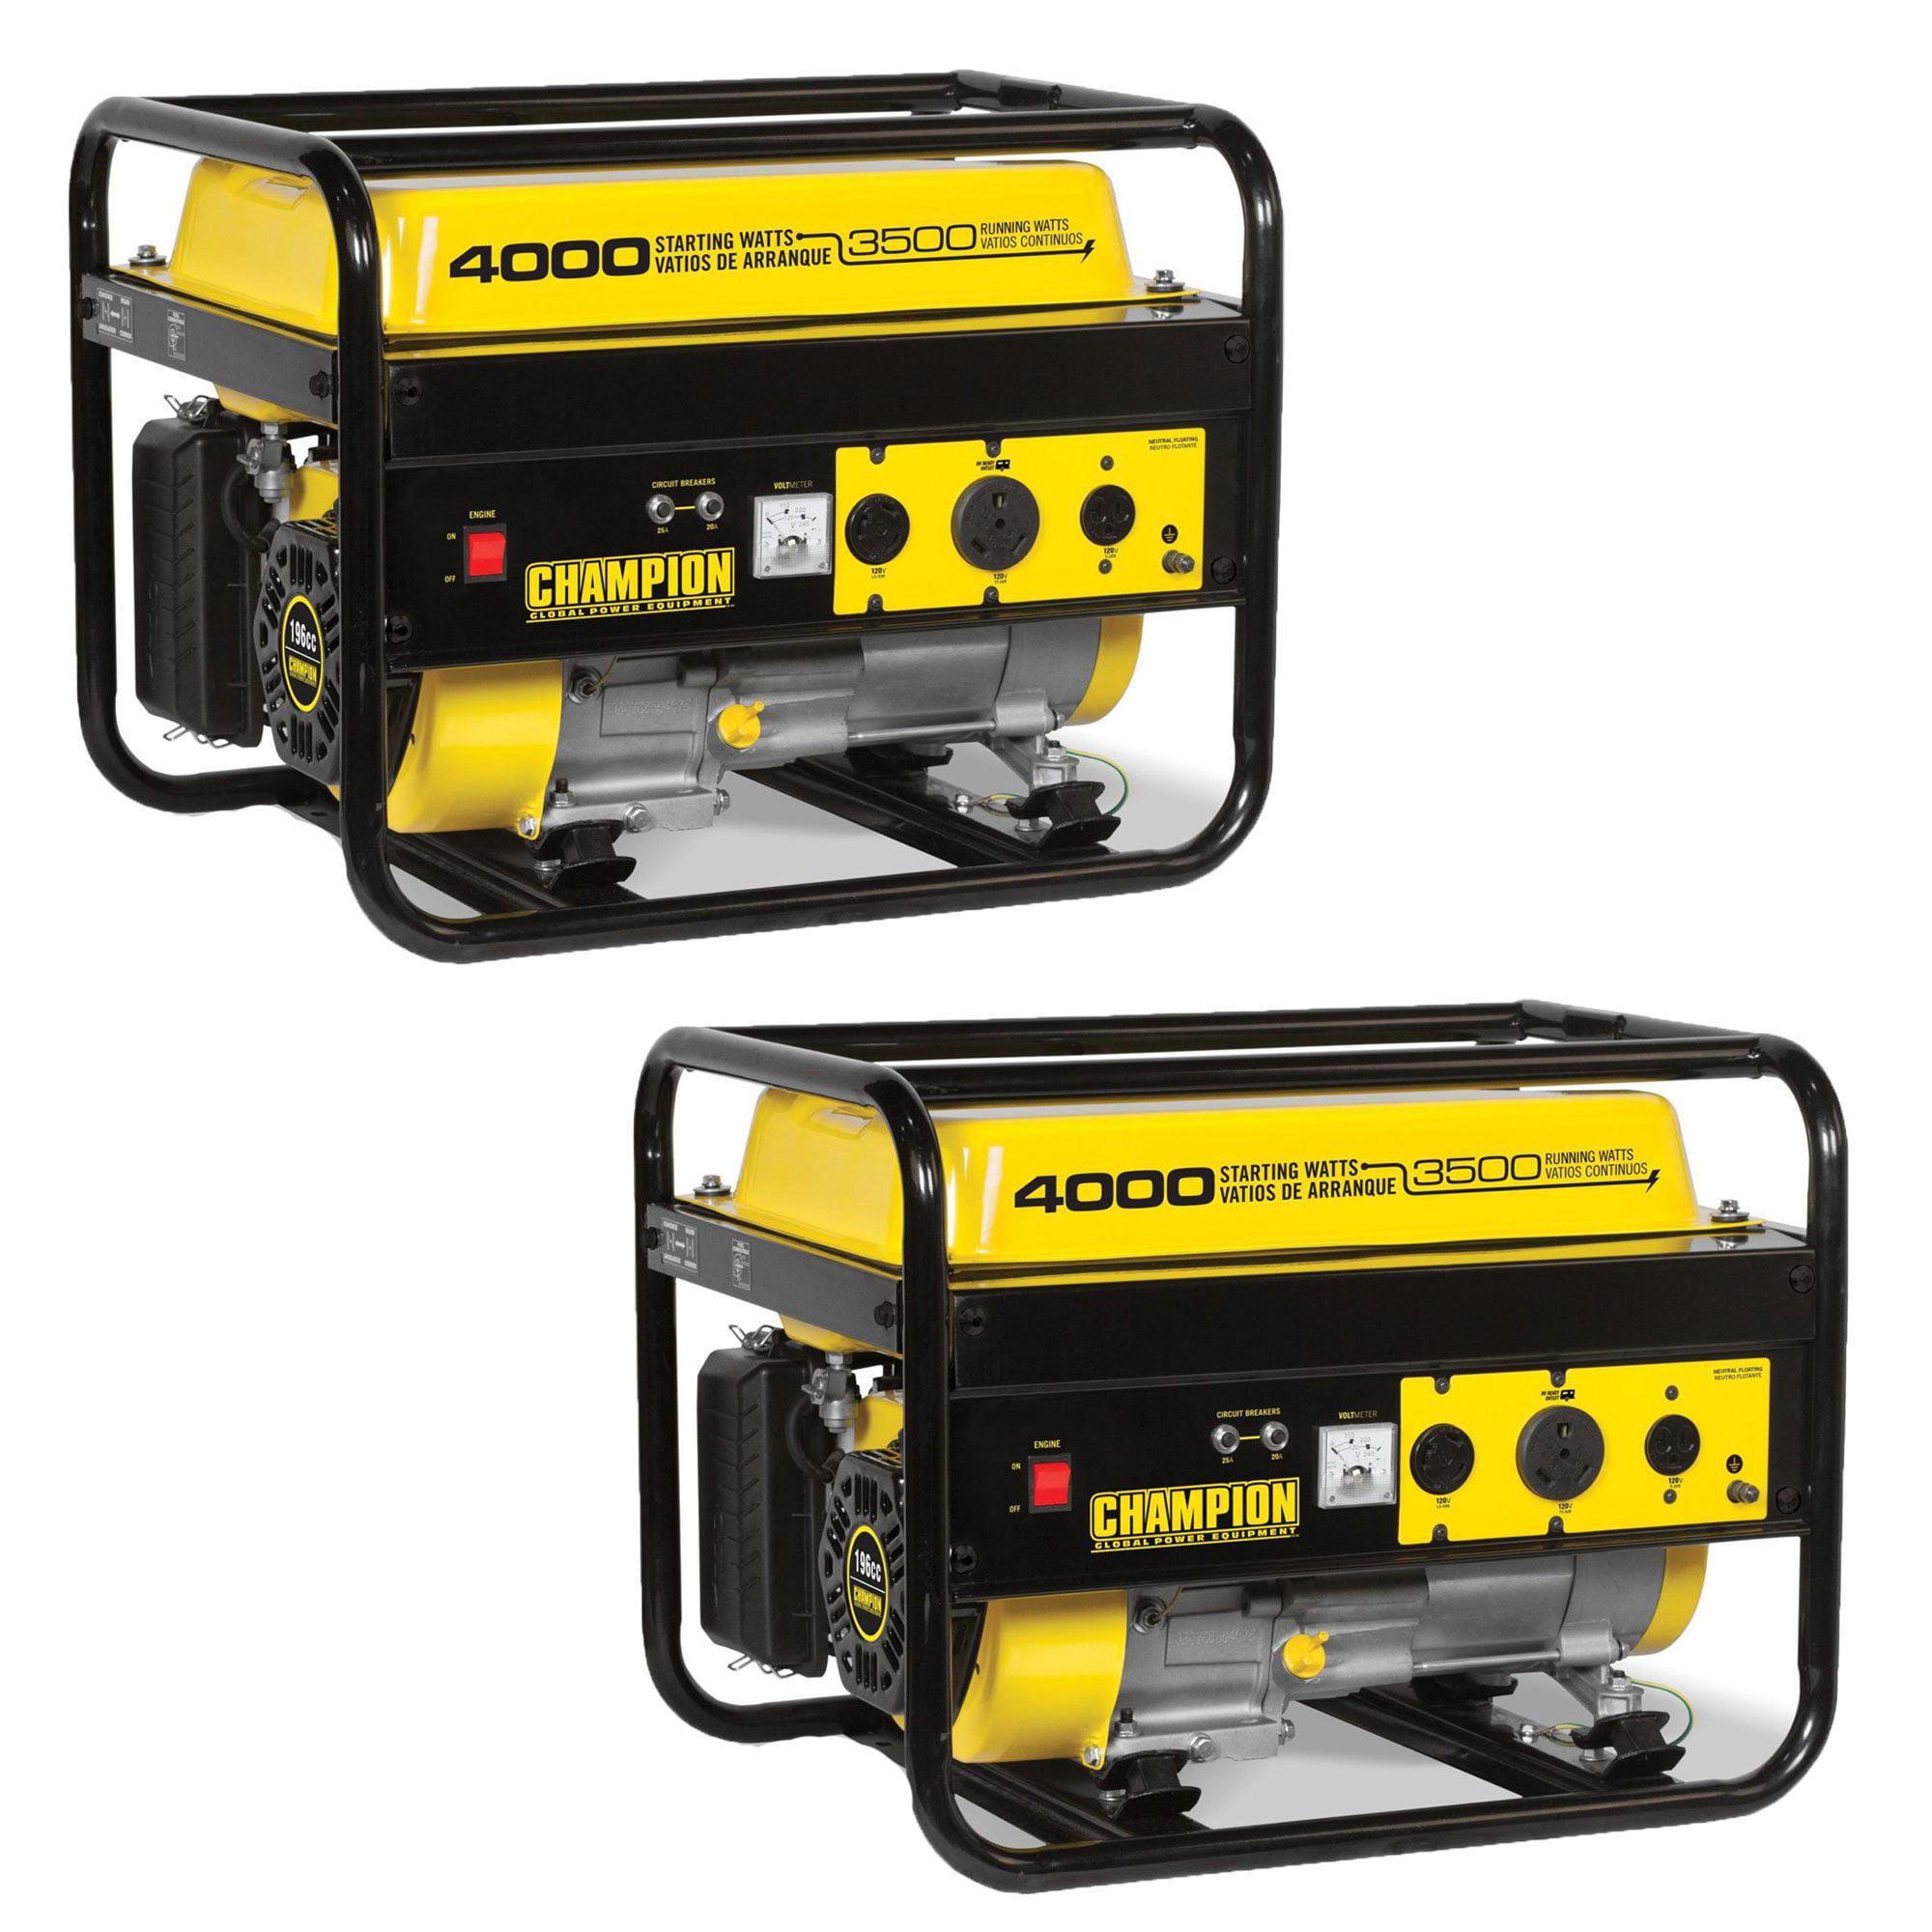 Champion 3500 Watt Portable Quiet Recoil Start Gas Home & RV Generator (2 Pack)